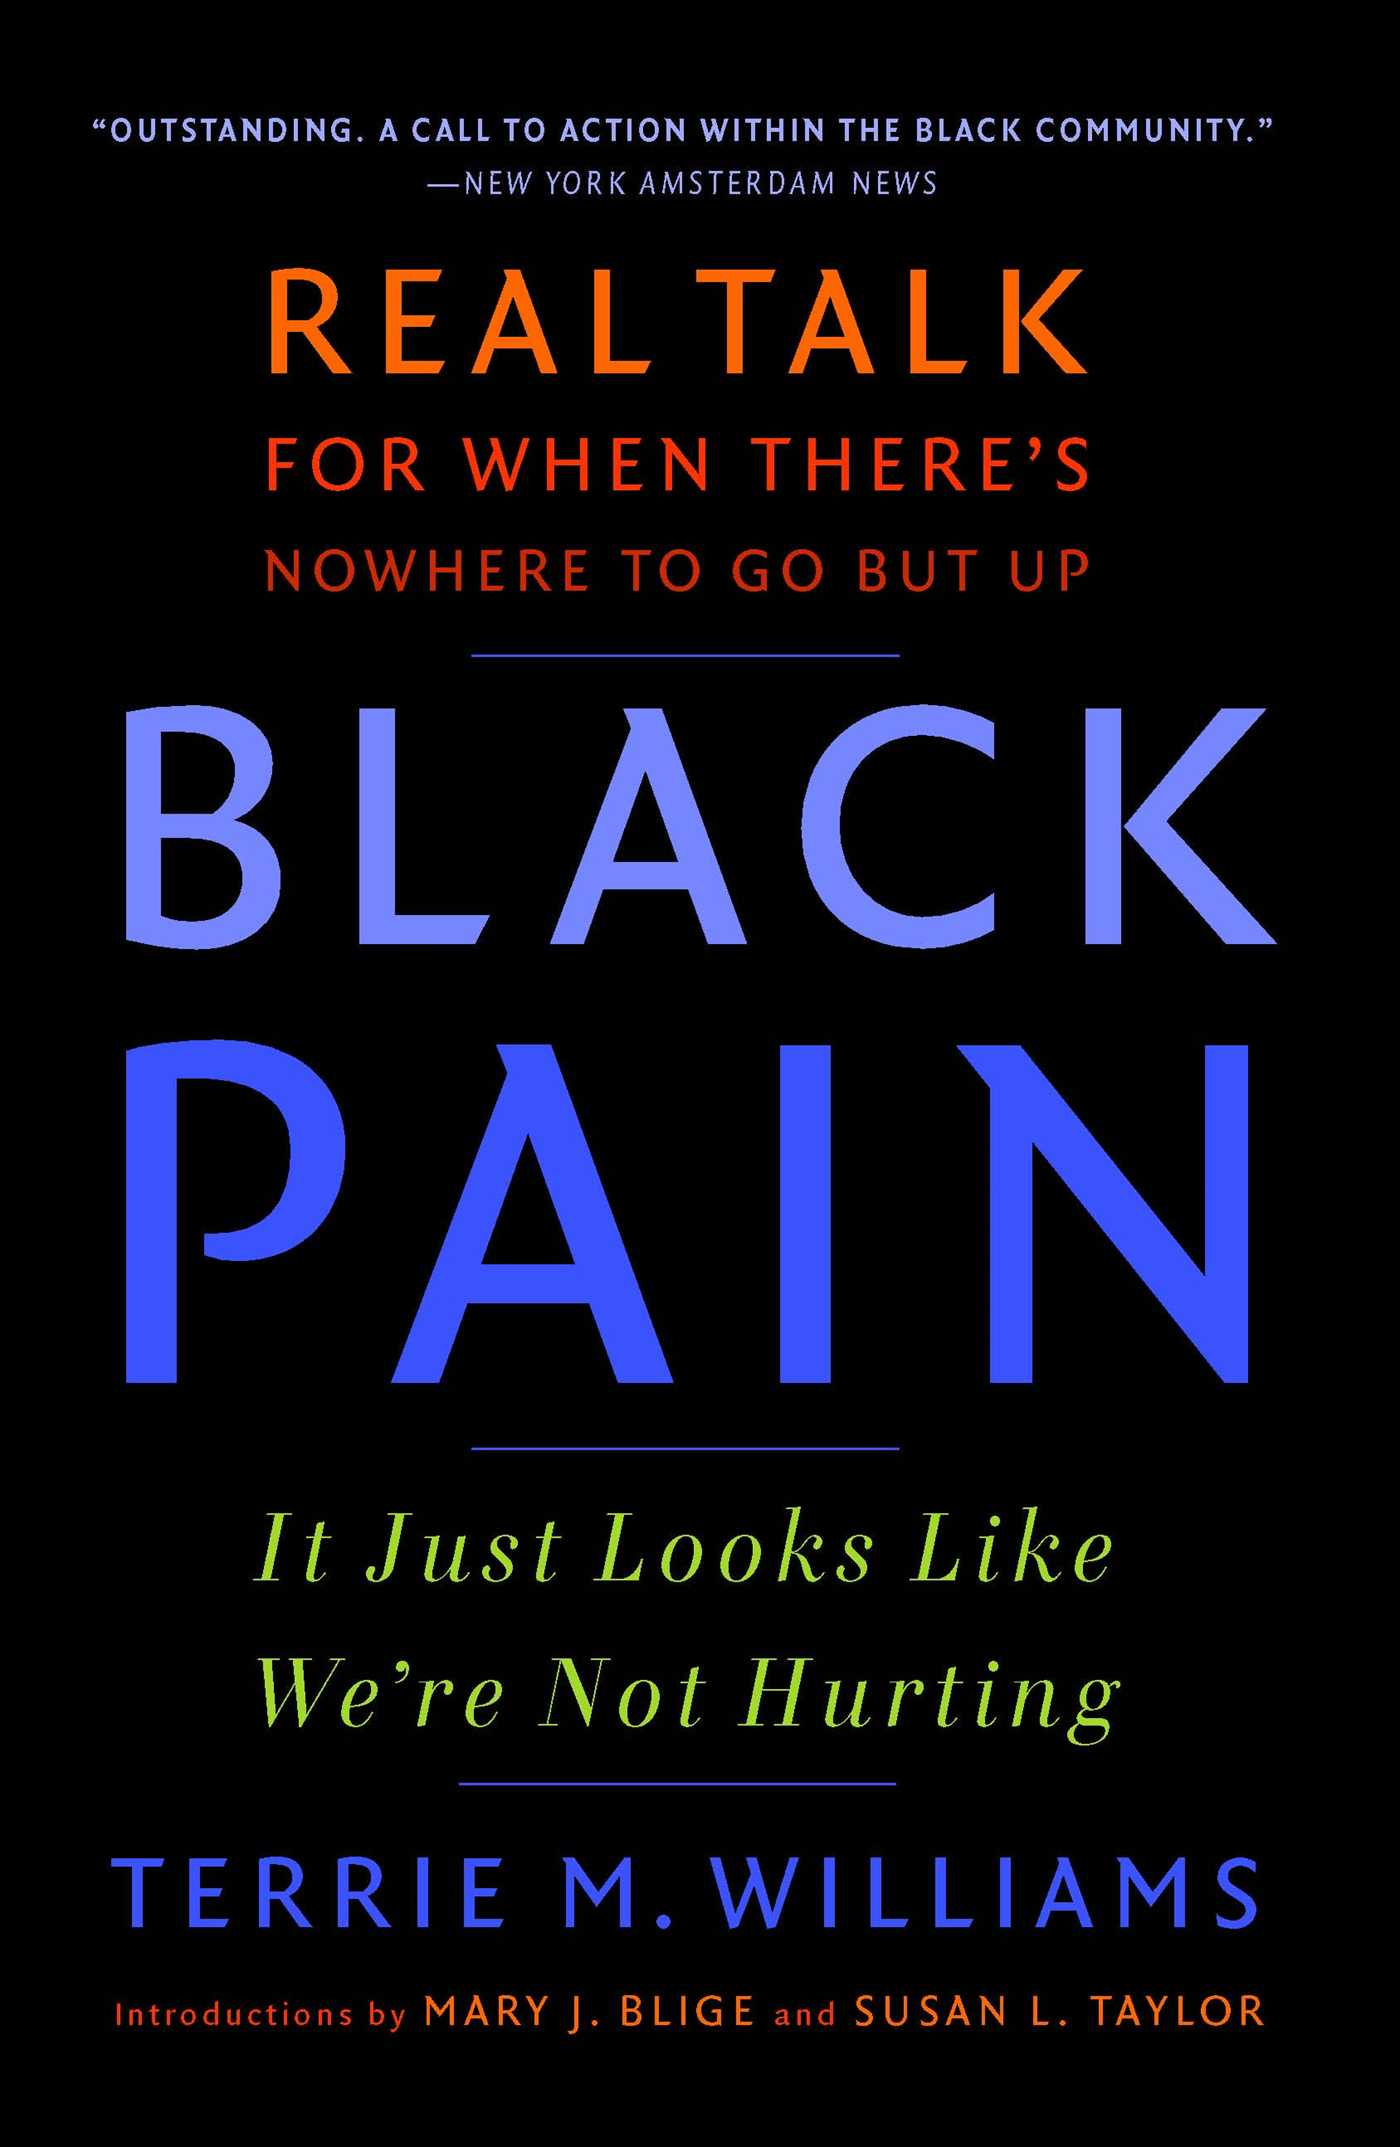 Black pain 9780743298834 hr